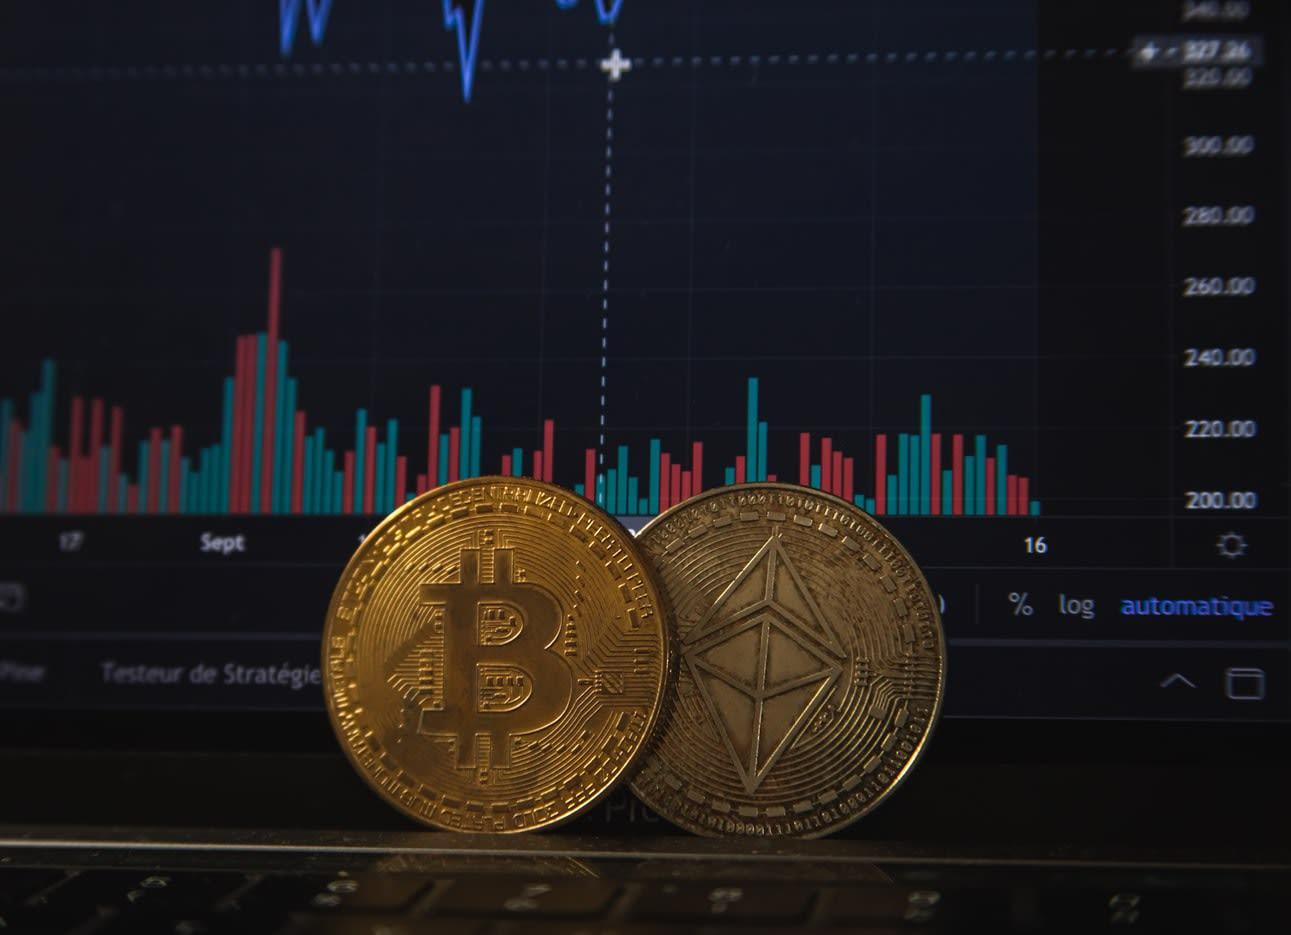 Jogo de Bitcoin aumentará após o anúncio recente do PayPal